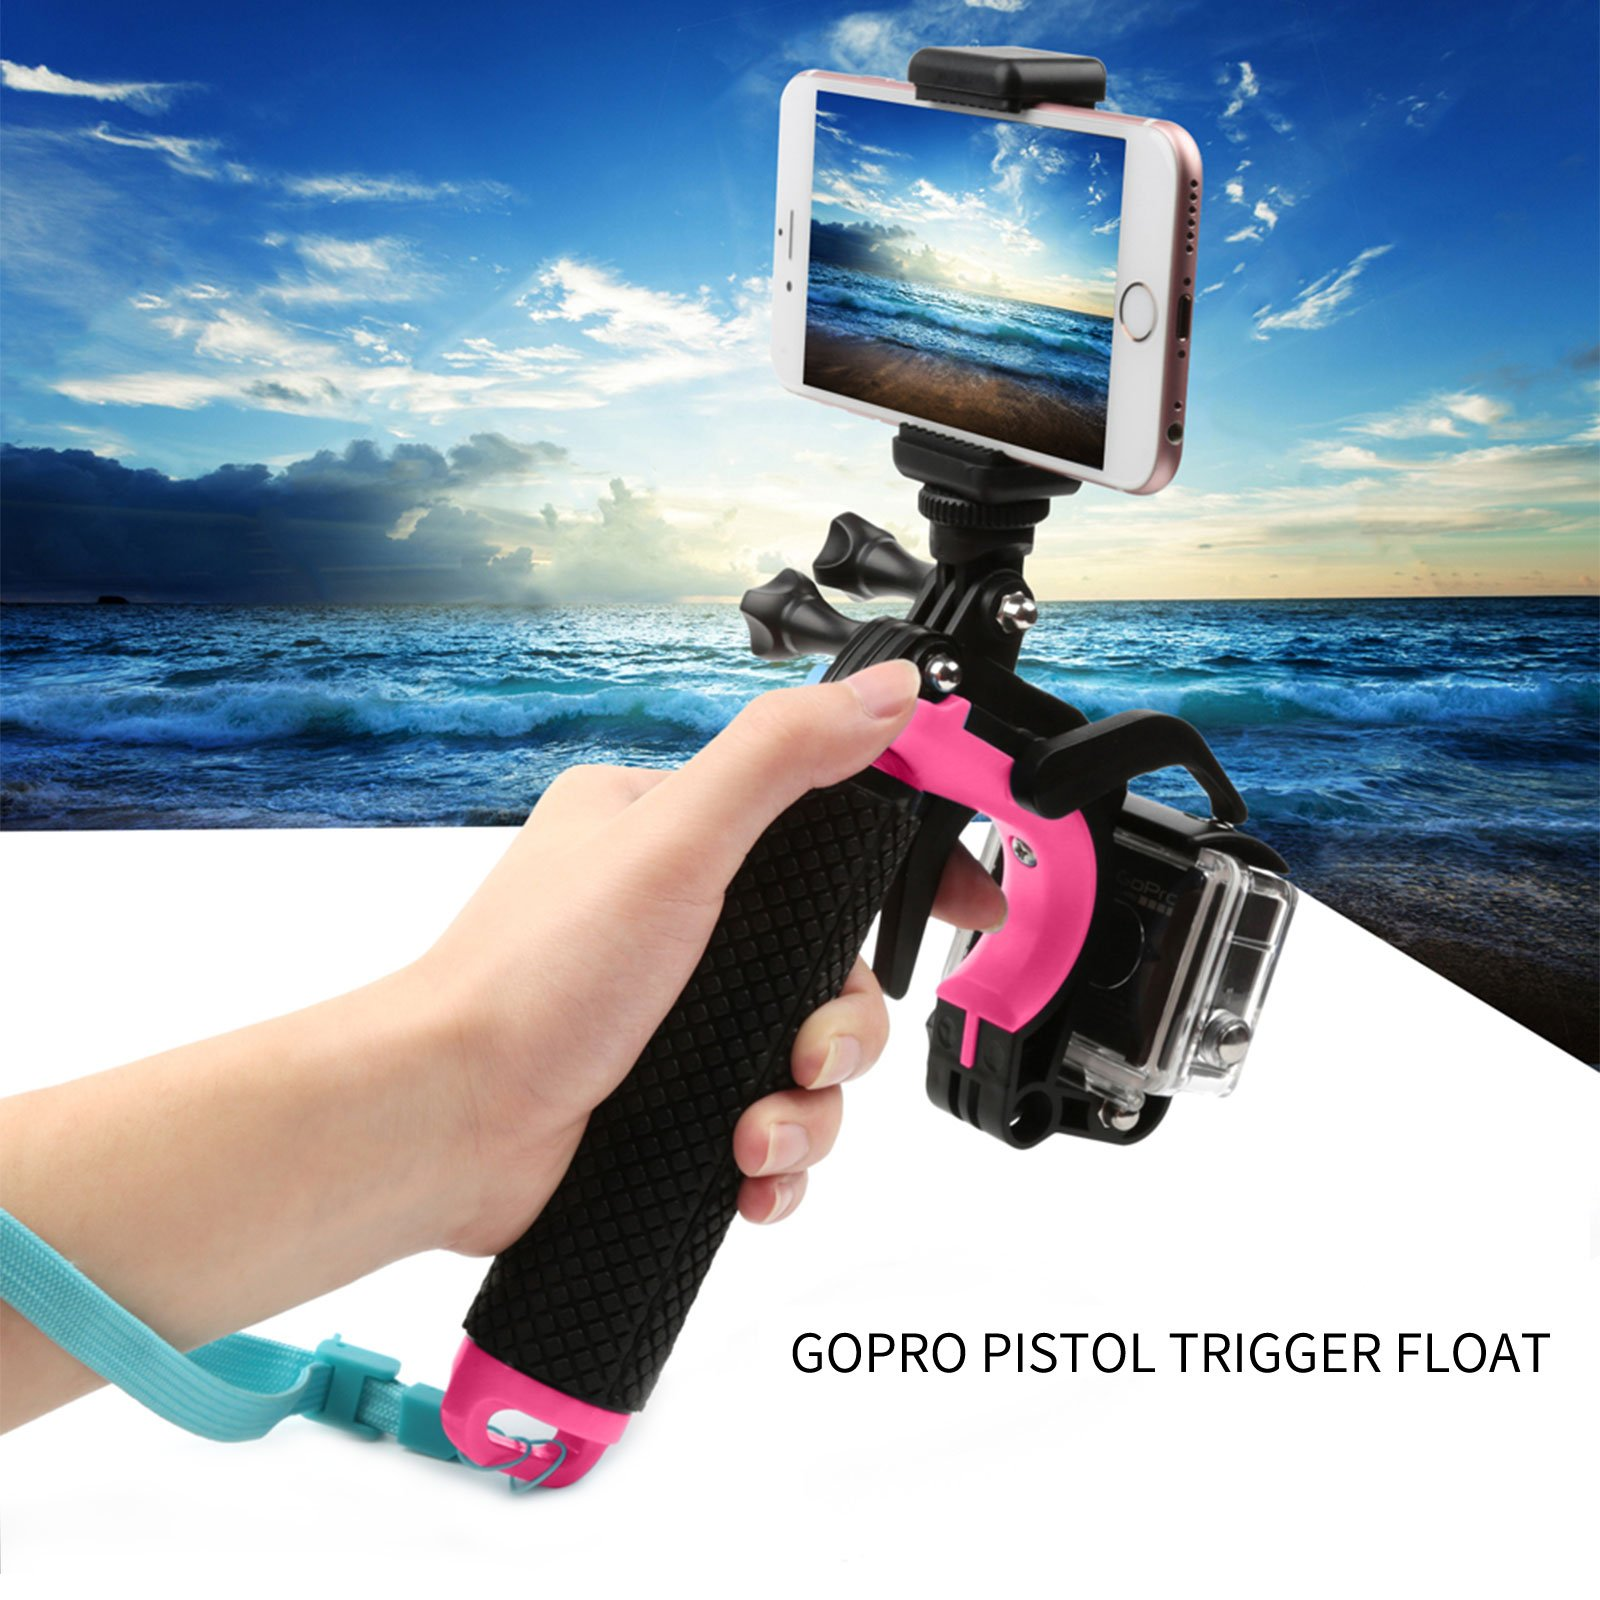 ARCHE GoPro Waterproof Pistol Shutter Trigger Kit for Gopro Hero 6 Black, Gopro Hero 5, Hero 4,Hero 3+ Hero 3, Hero+LCD Yi Action SJCAM Xiaomi (Blue/Green/Orange/Pink/Yellow) (Pink)